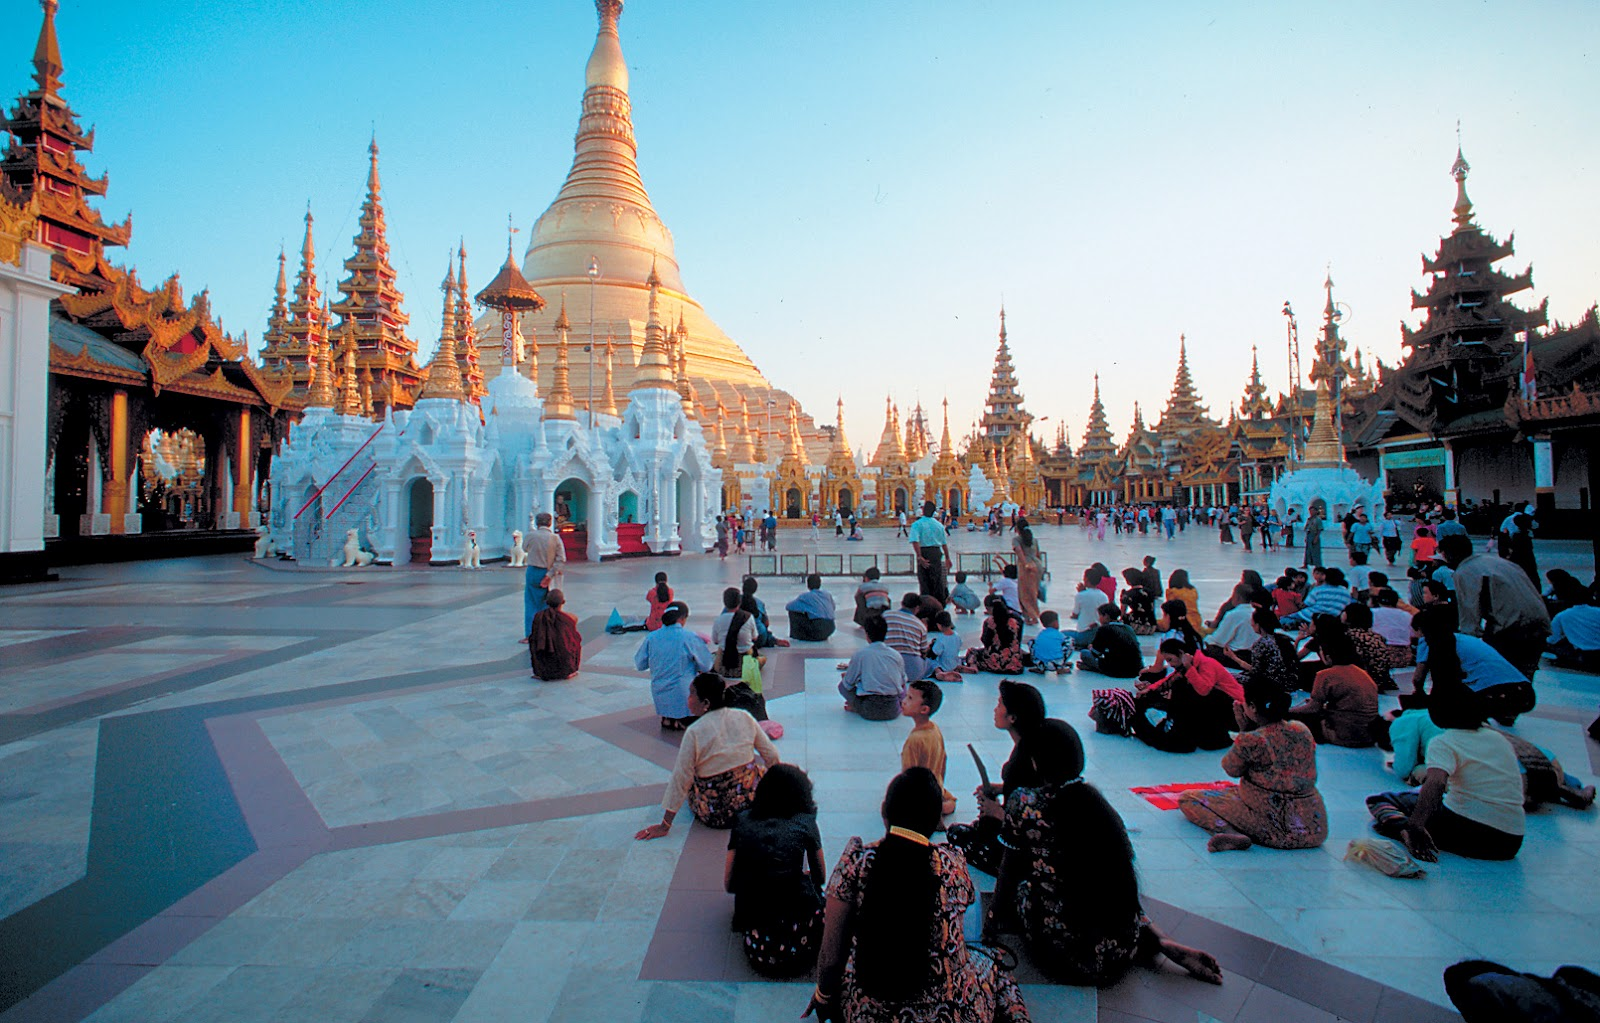 myanmar - photo #41